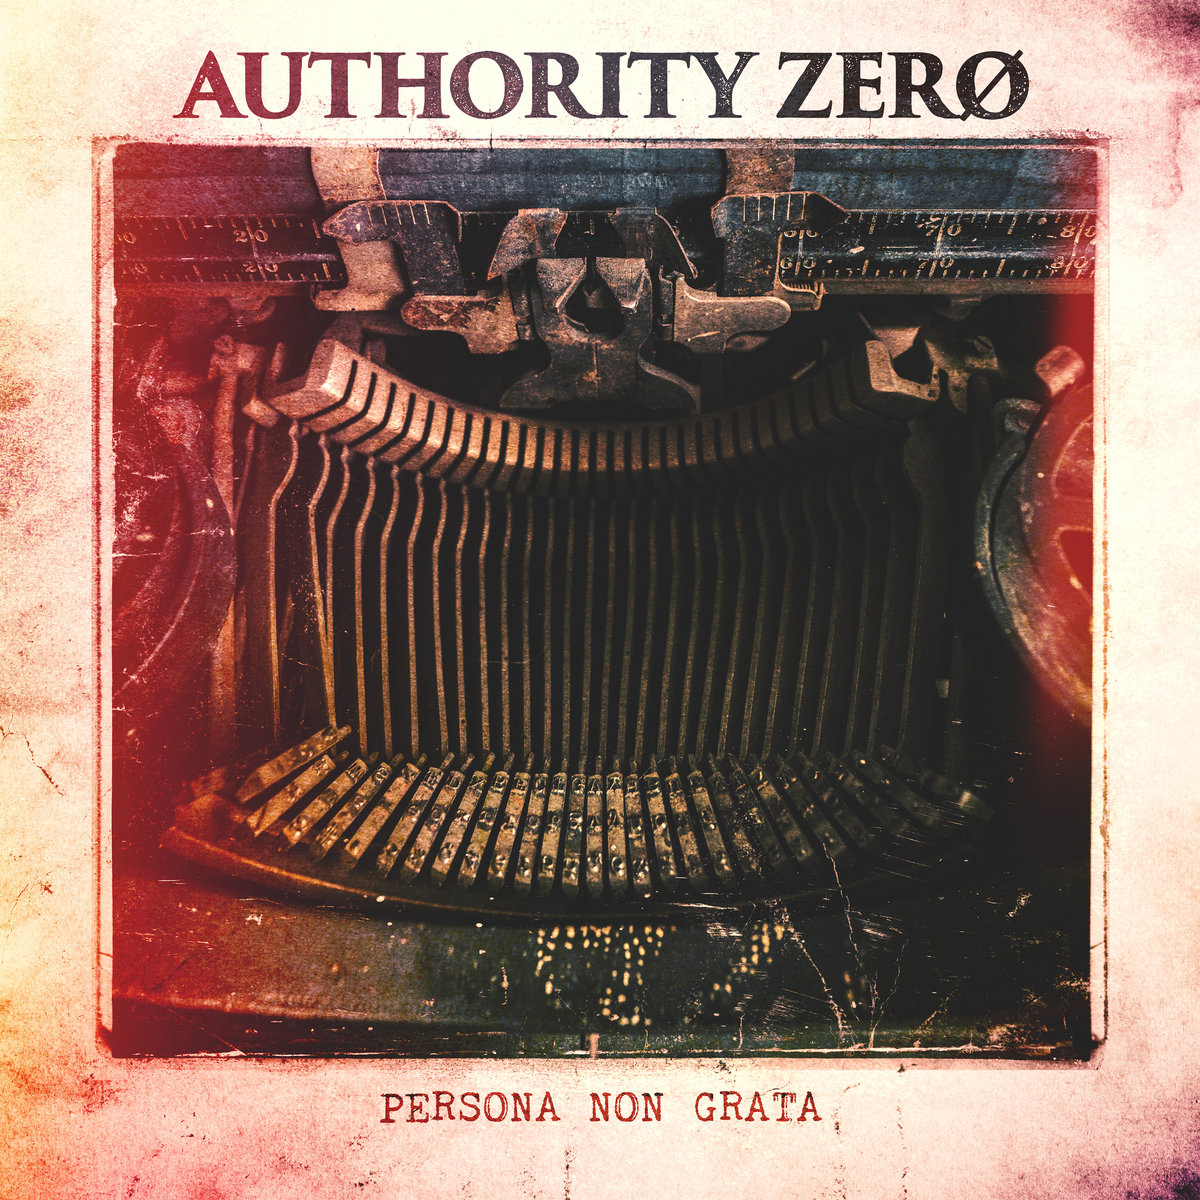 authority zero persona non grata.jpg